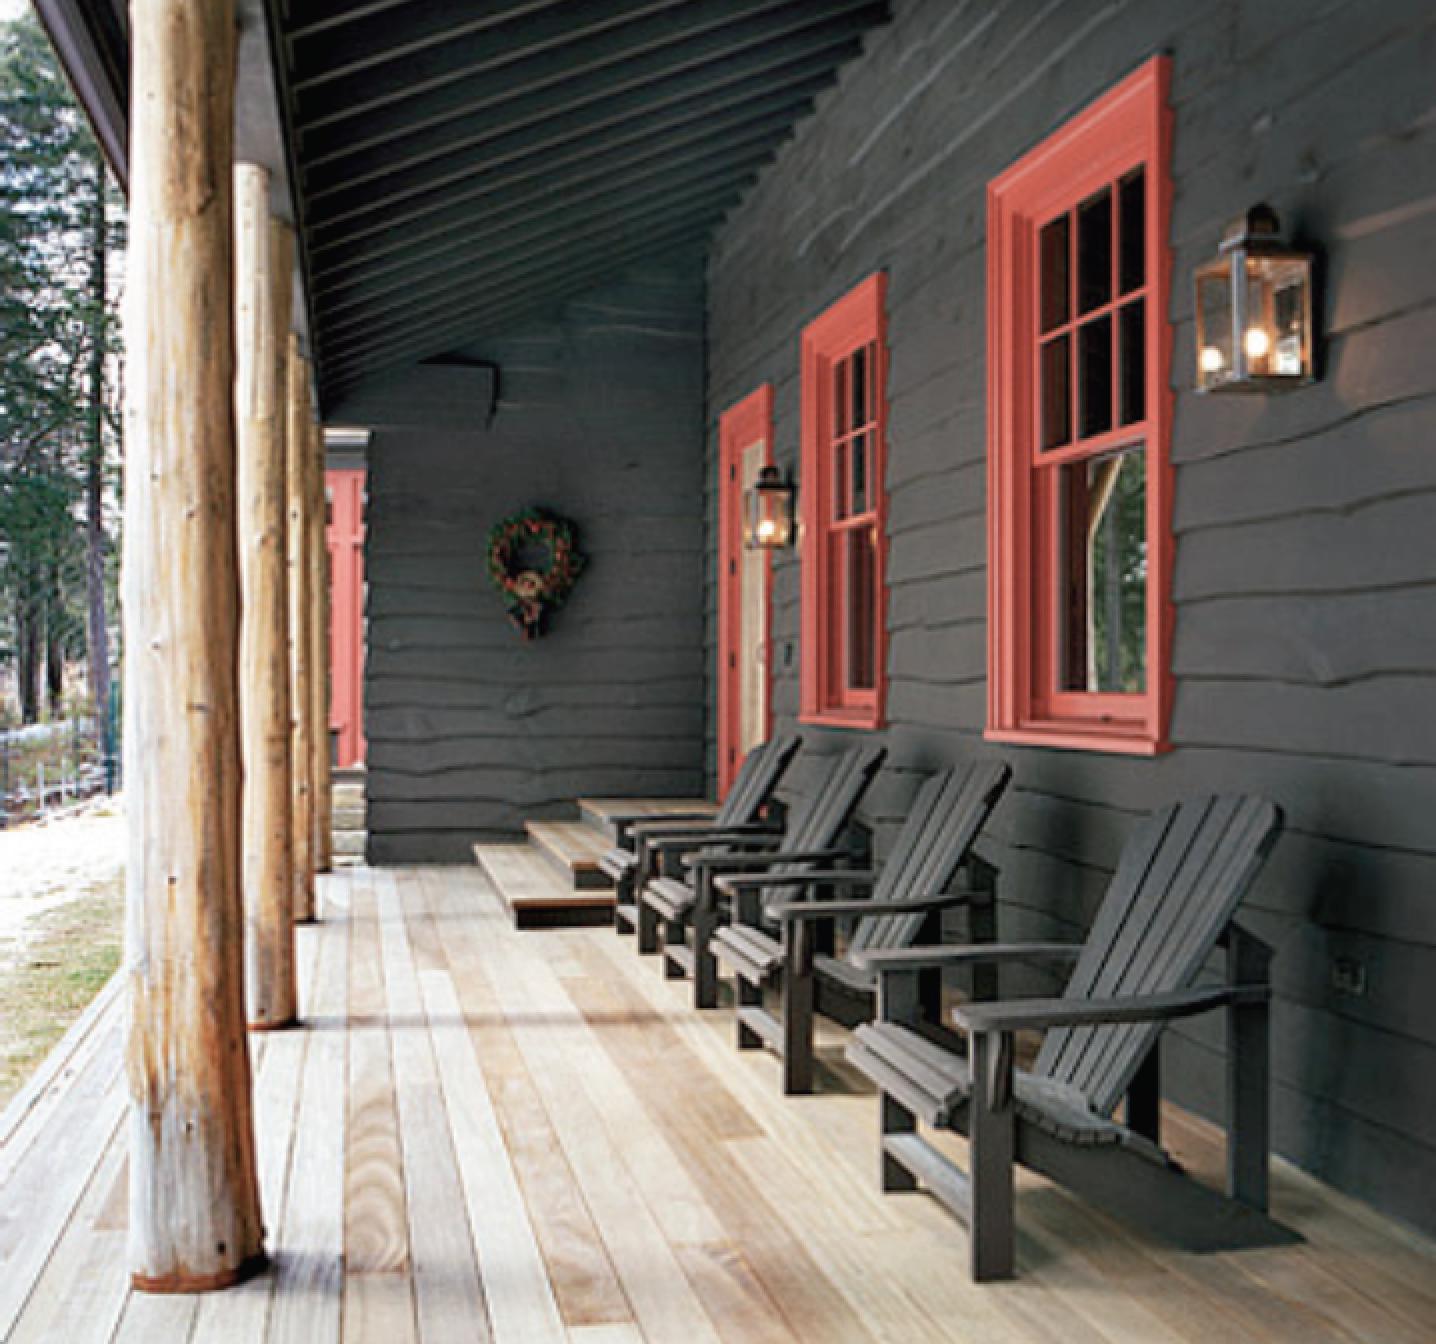 Long Lasting Exterior House Paint Colors Ideas: A Twist On The Adirondack Color Scheme. Peter Pennoyer's Adirondack House